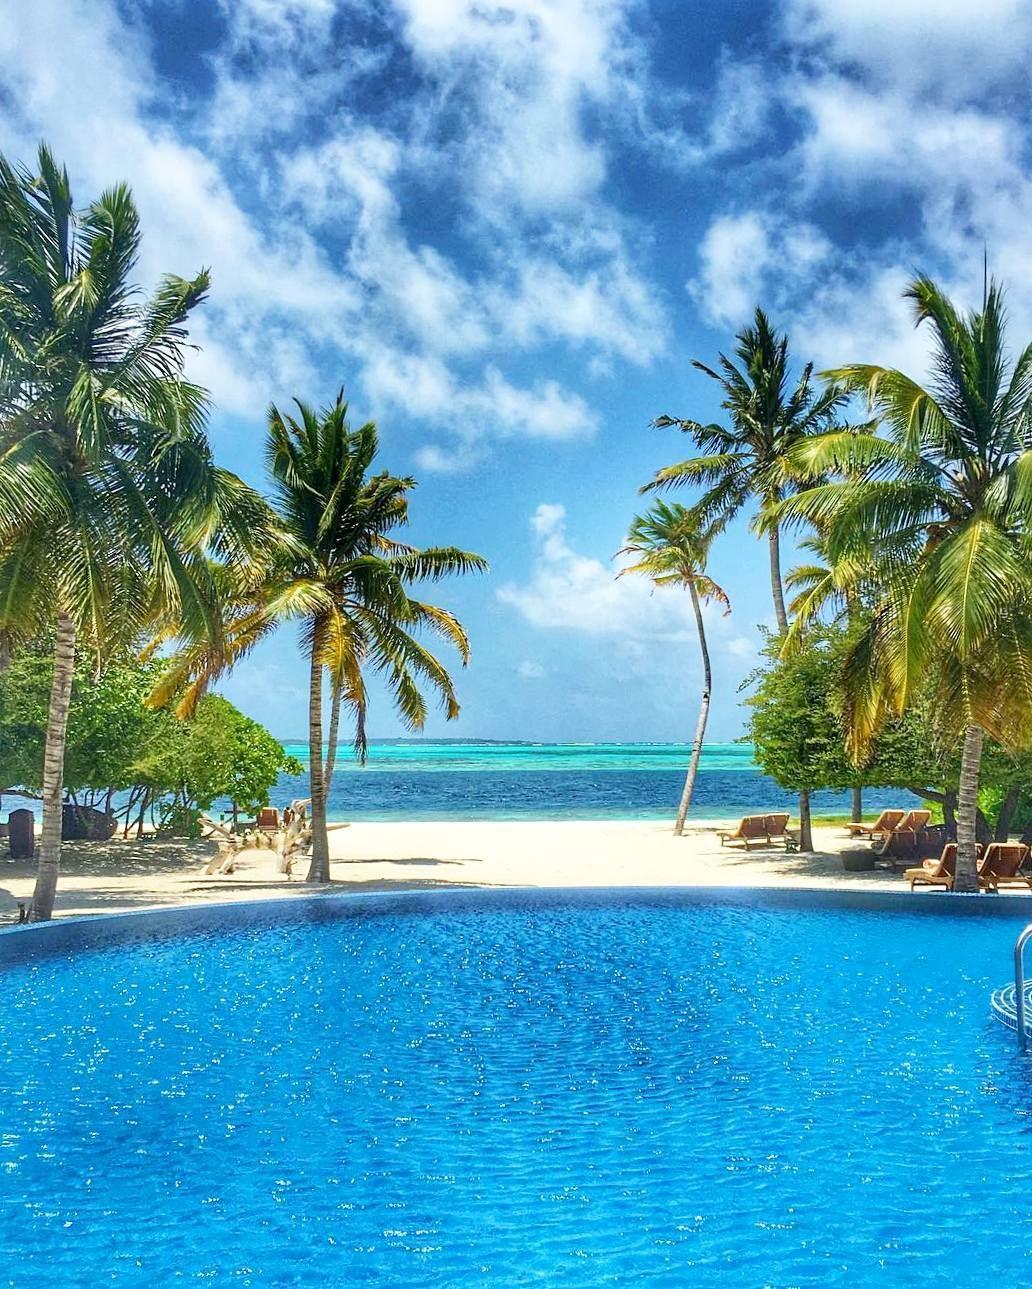 The Maldives Island Hideaway Beach Resort Spa Maldives 海 絶景 絶景 景色